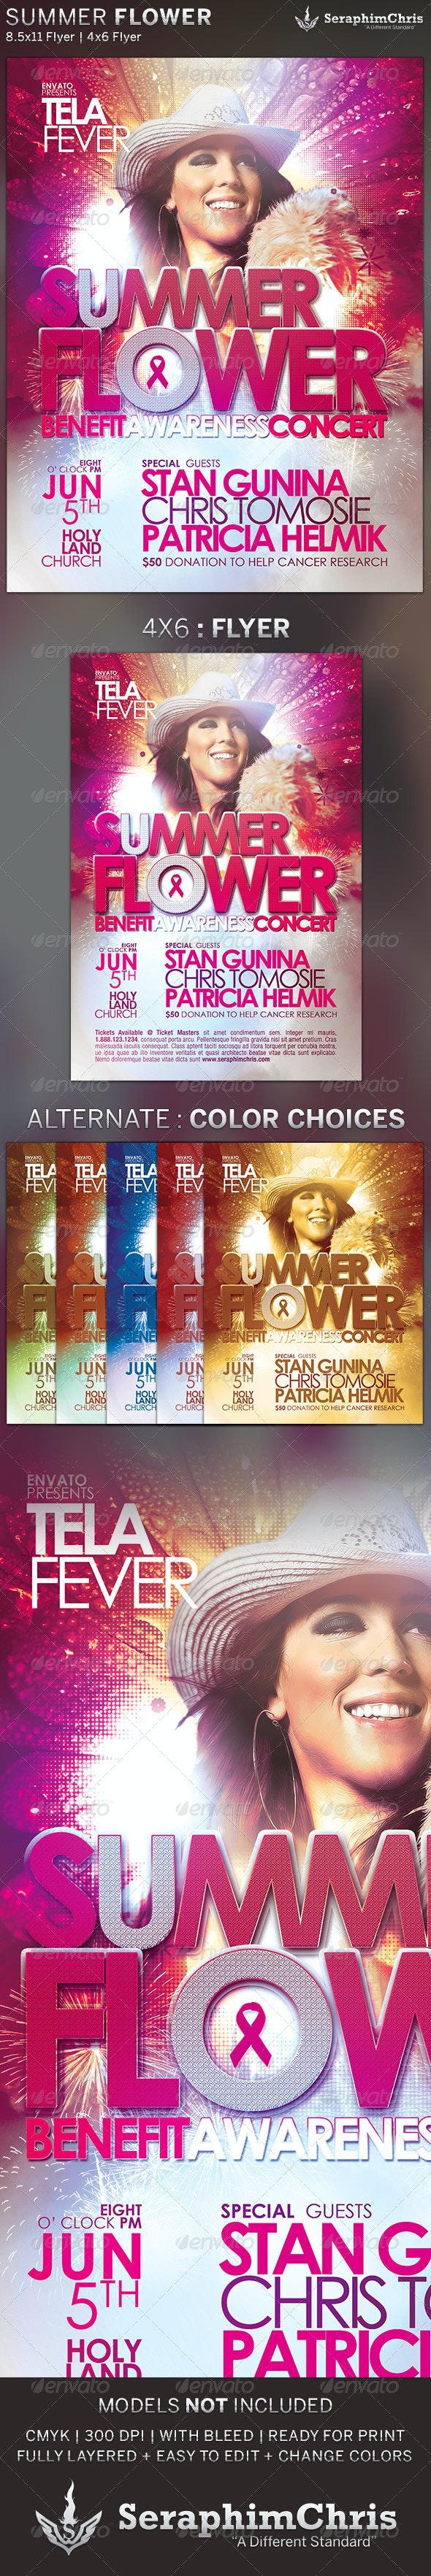 Summer Flower: Church Concert Flyer Template - Concerts Events